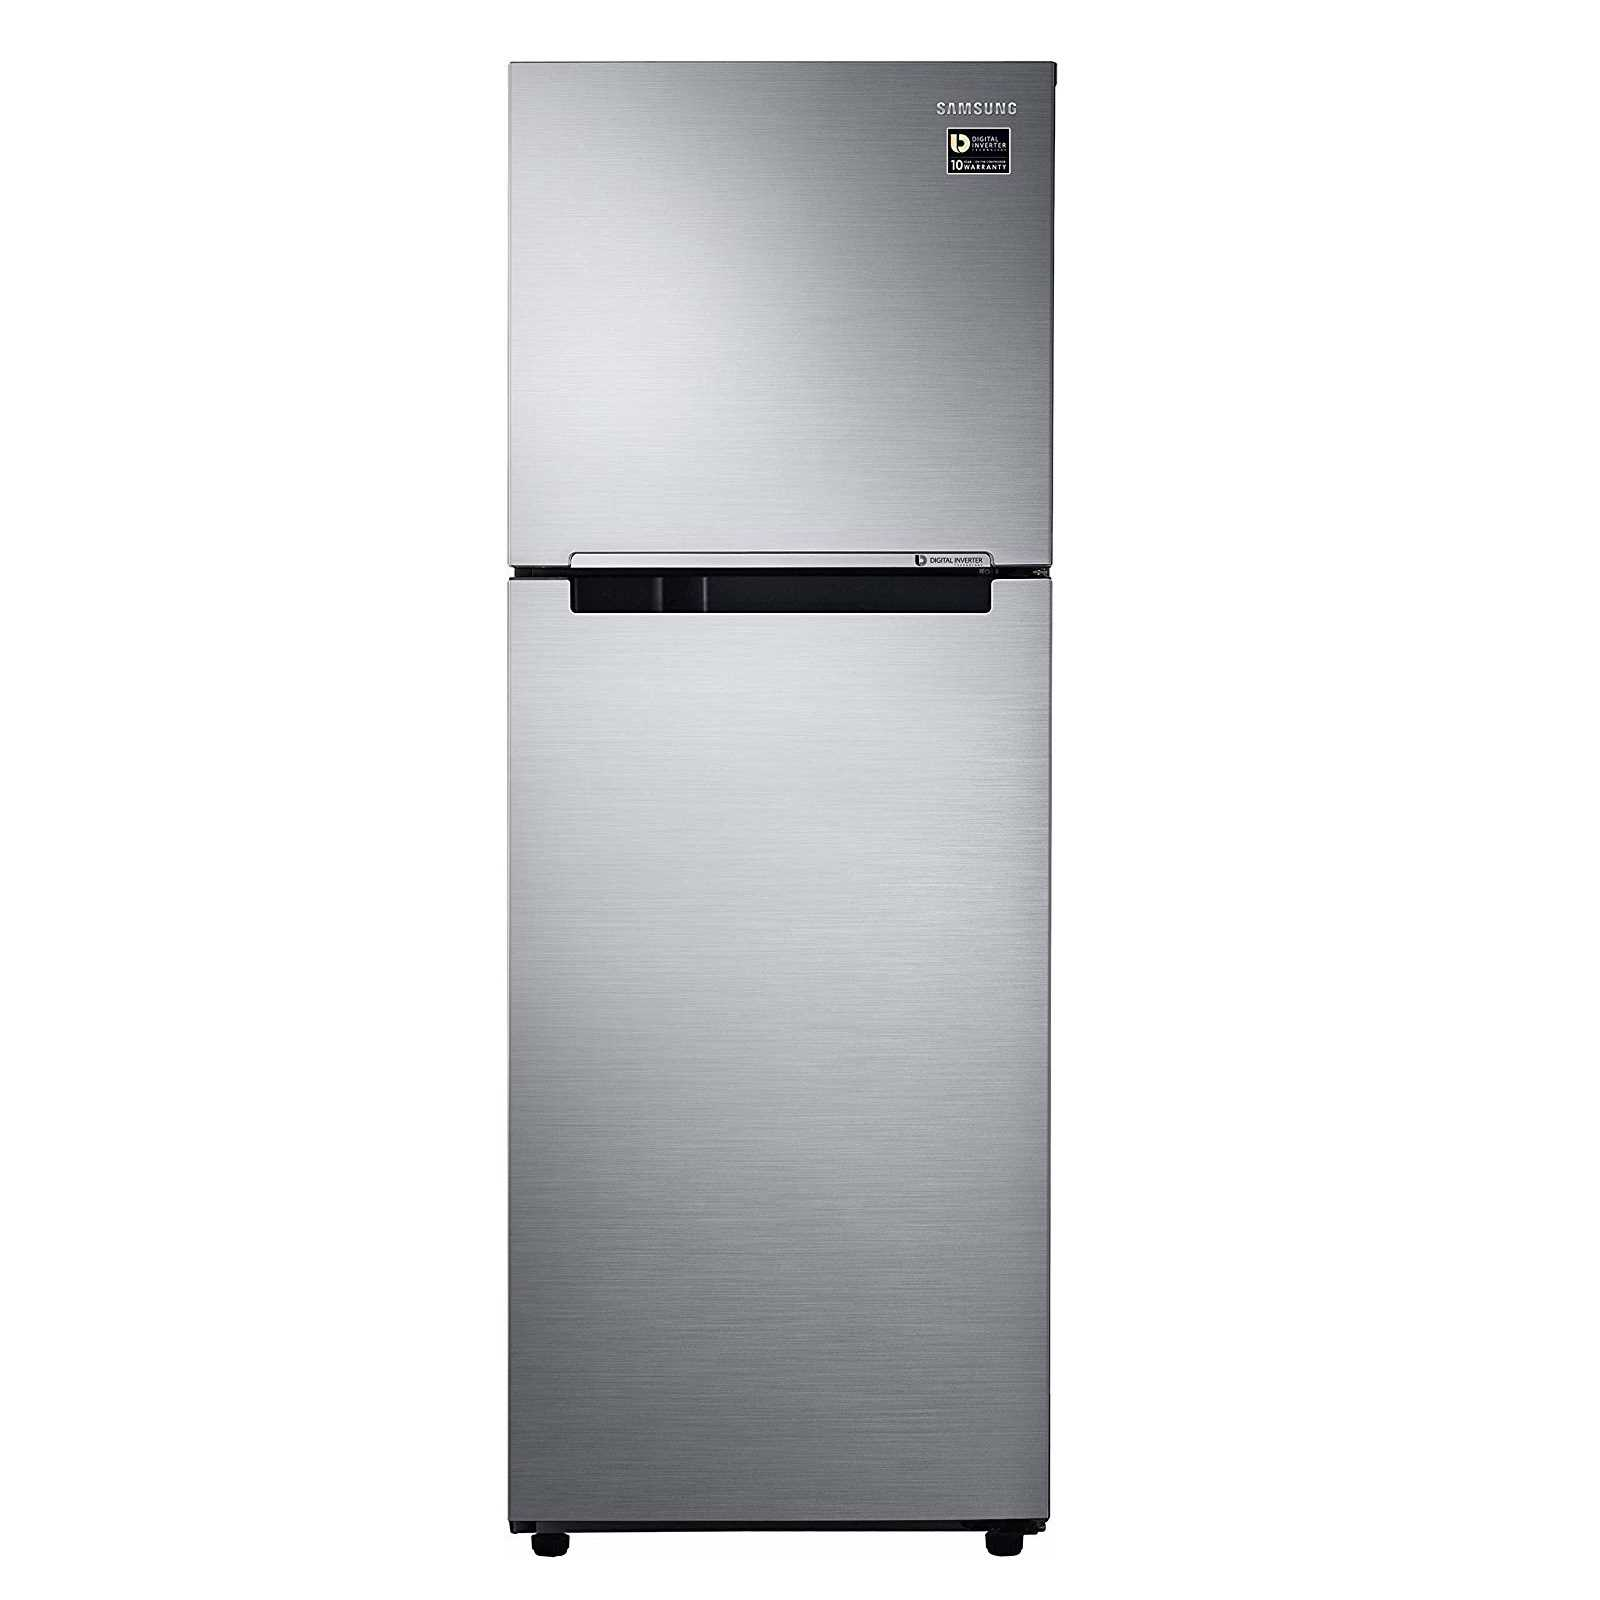 Samsung RT28R3053S9 HL 253 Liter 3 Star Frost Free Double Door Refrigerator